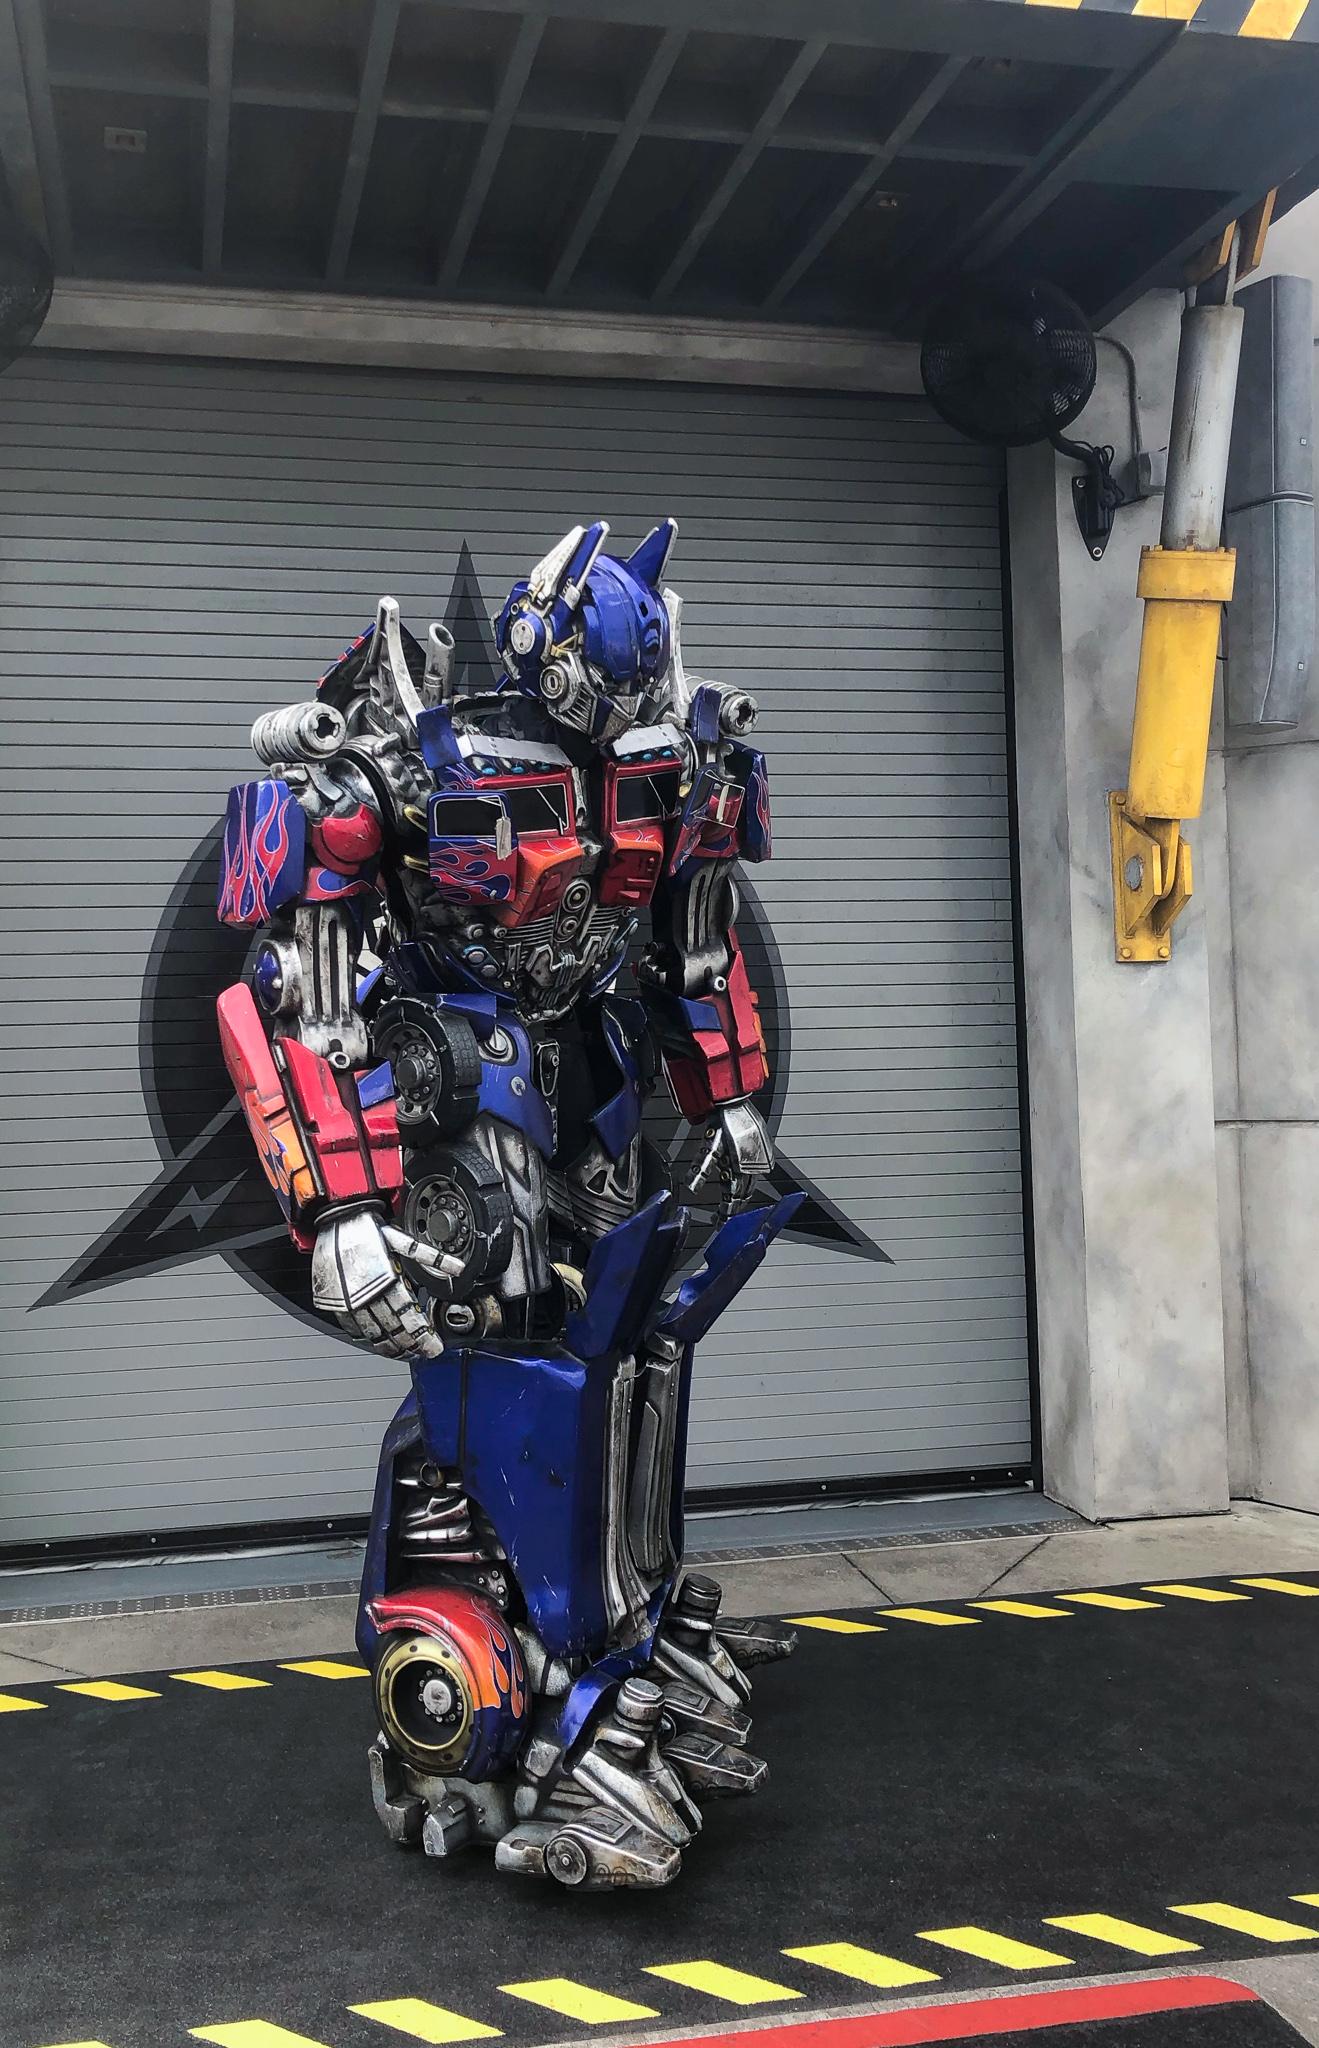 Pretparken in Florida - Universal Studios Florida - Transformers